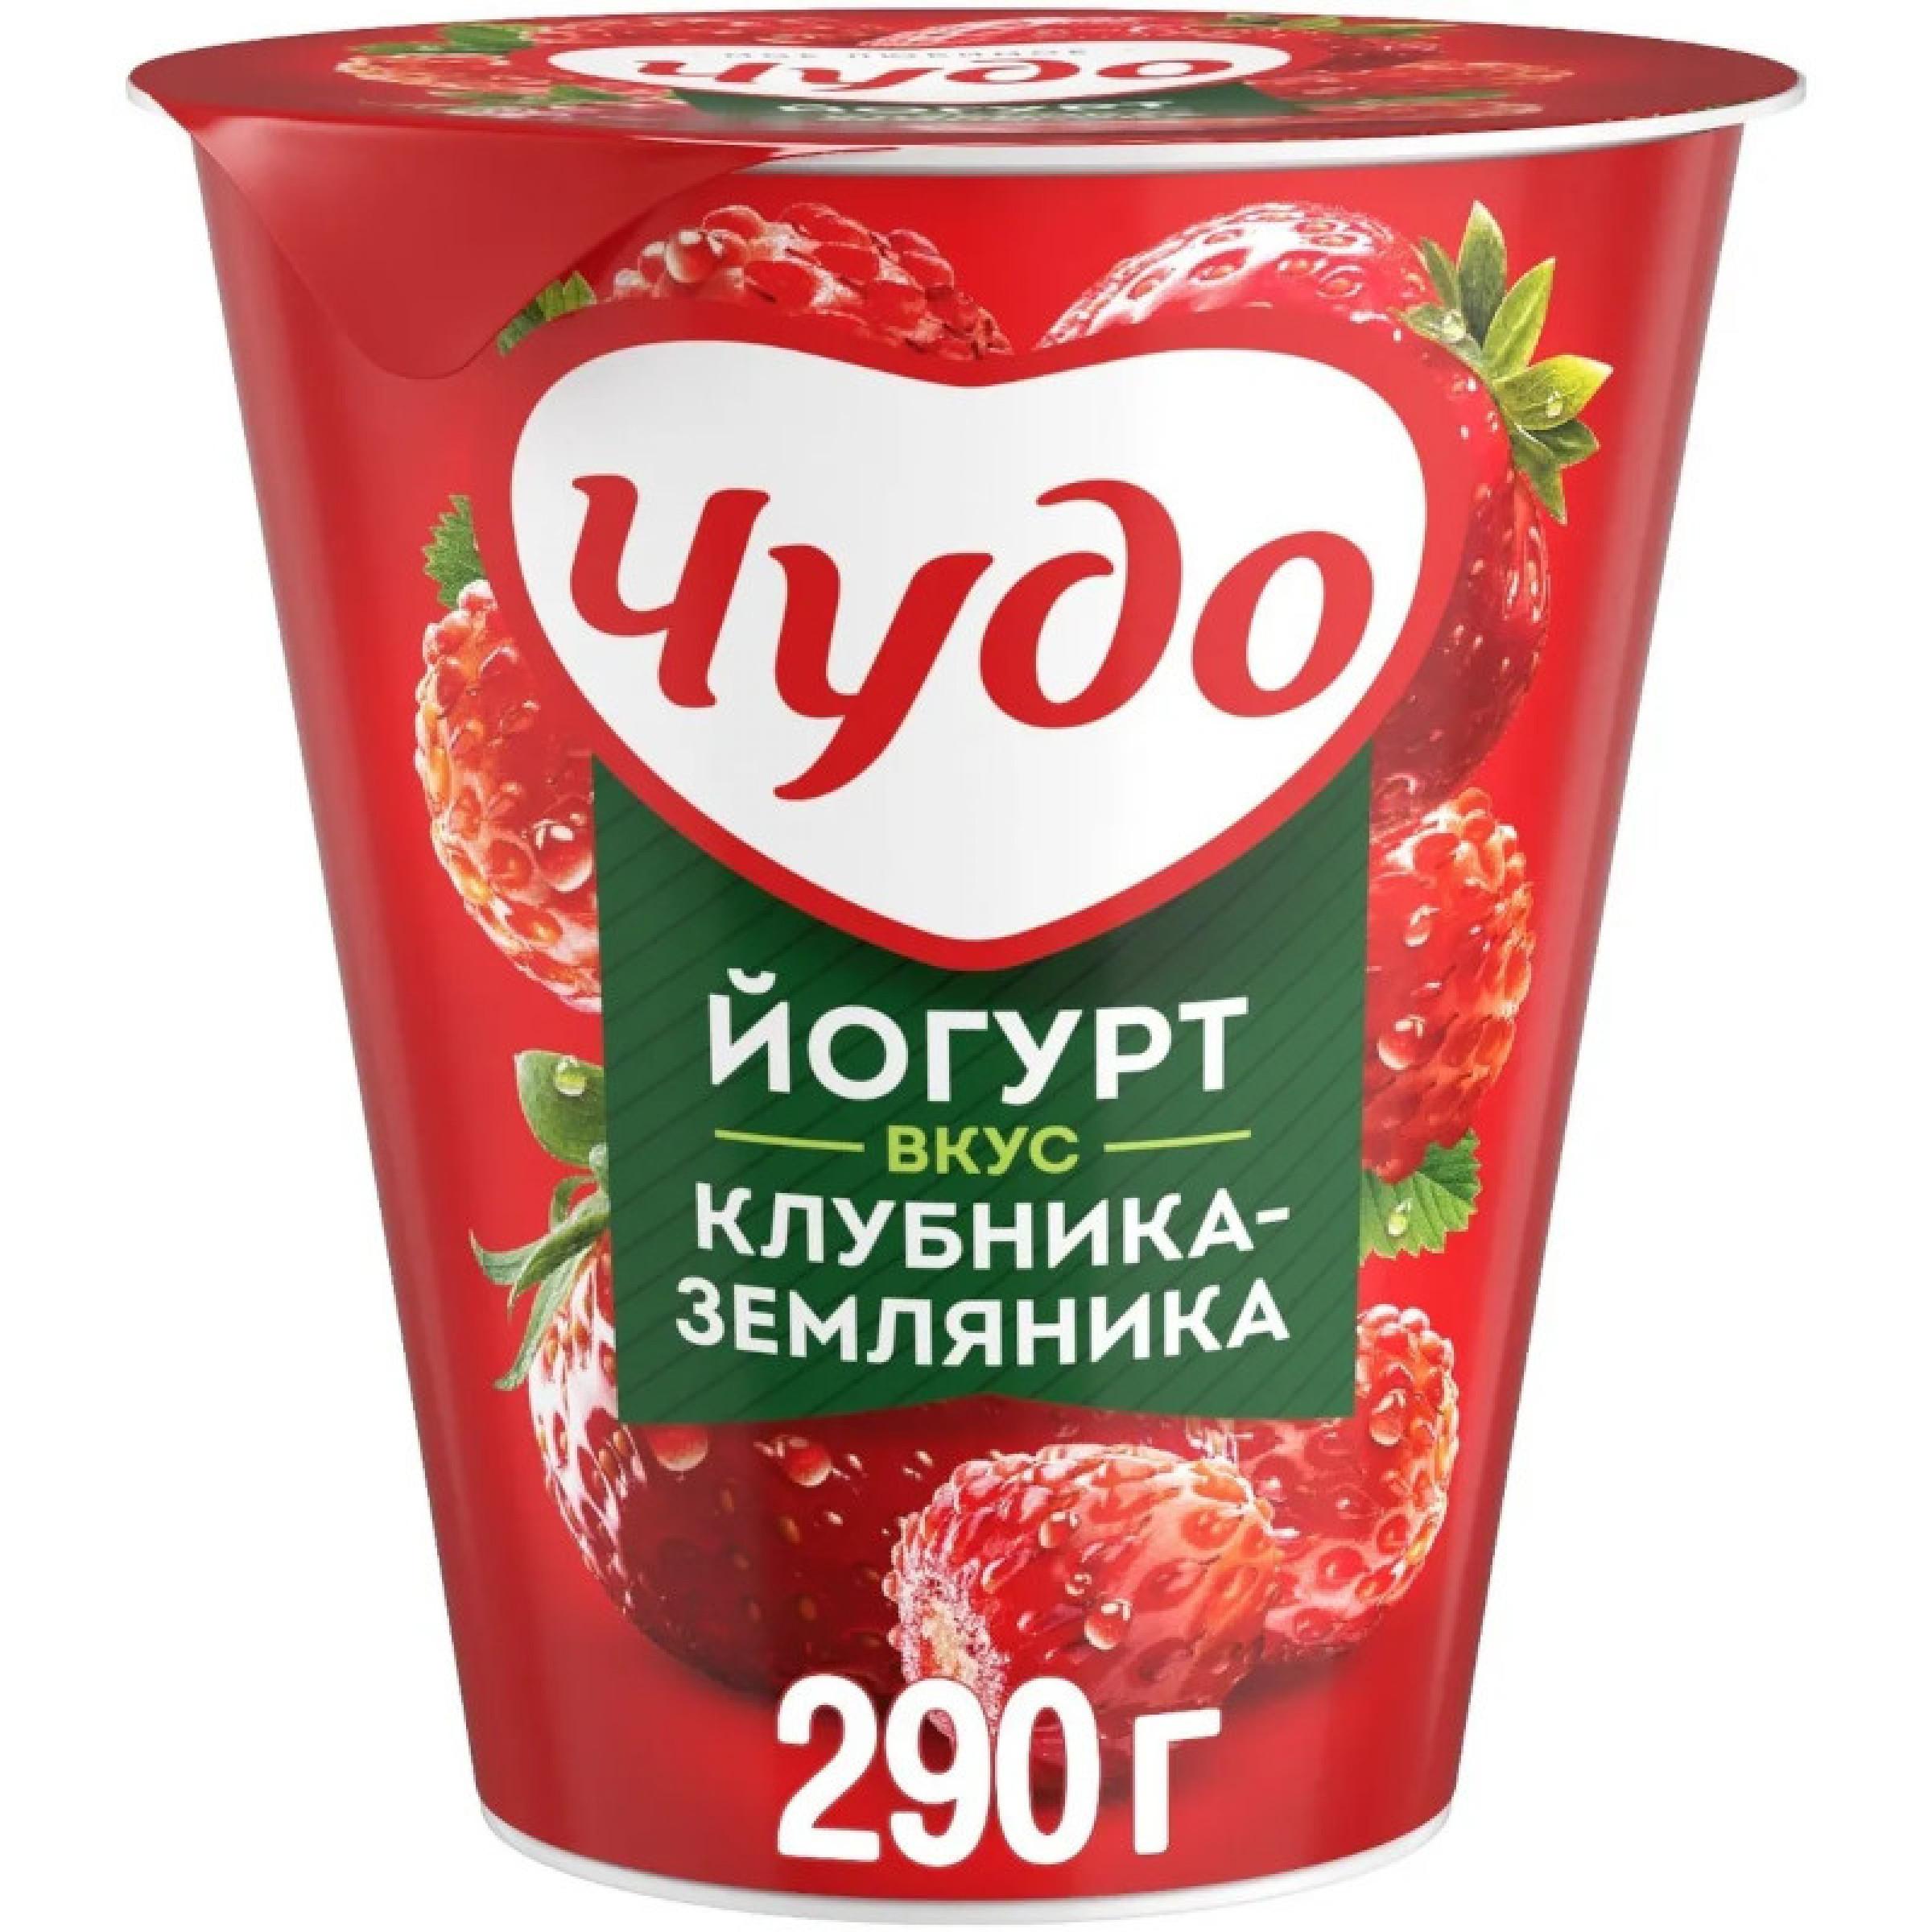 "Йогурт ""Чудо"" 2,5% клубника-земляника, 290 г"